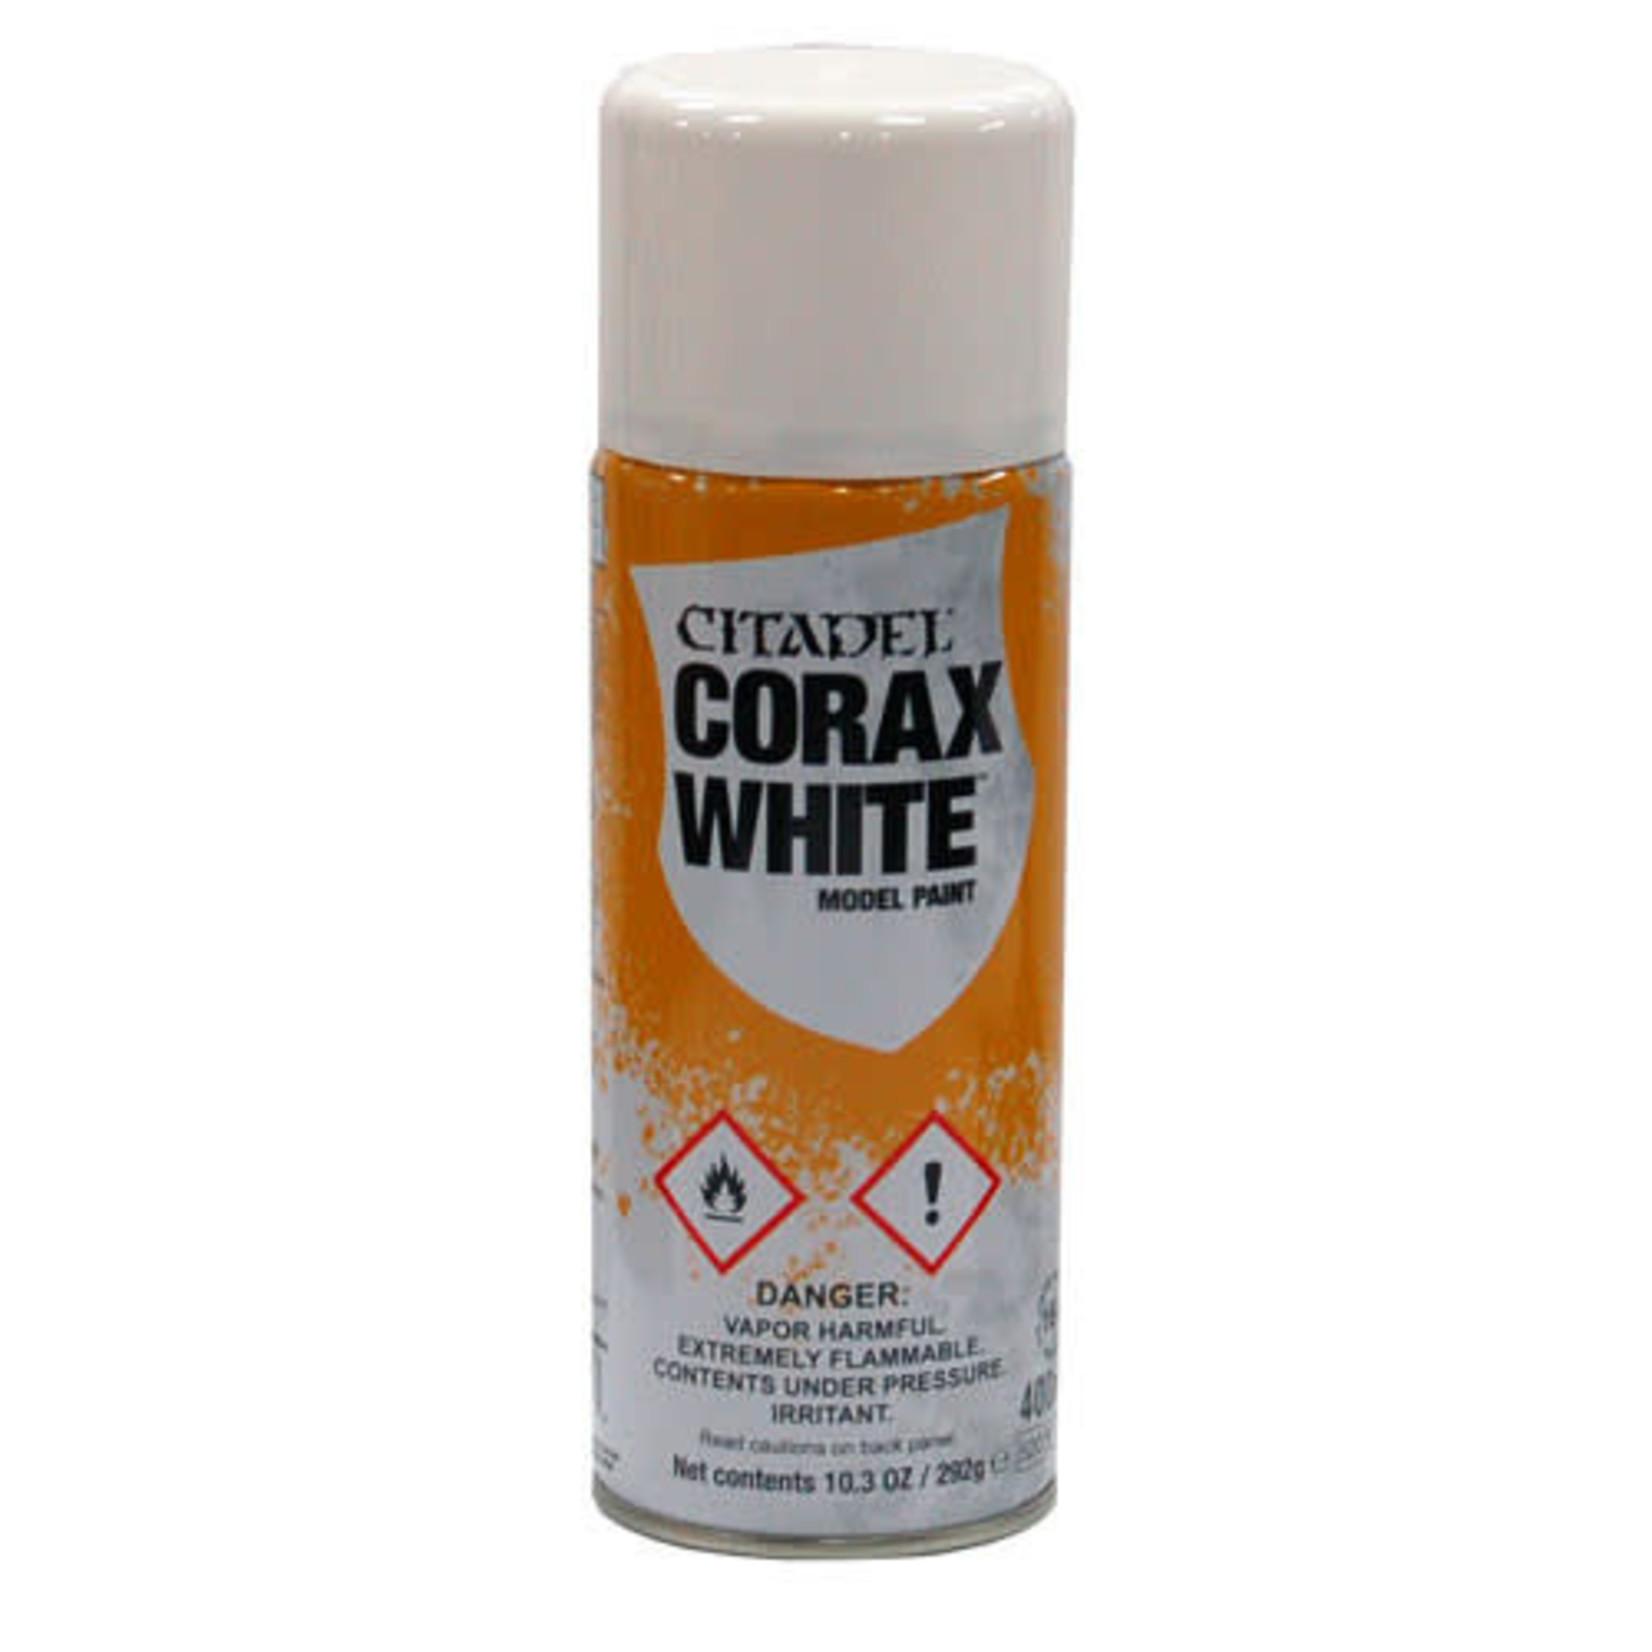 Citadel Citadel Paint - Primer: Corax White Spray